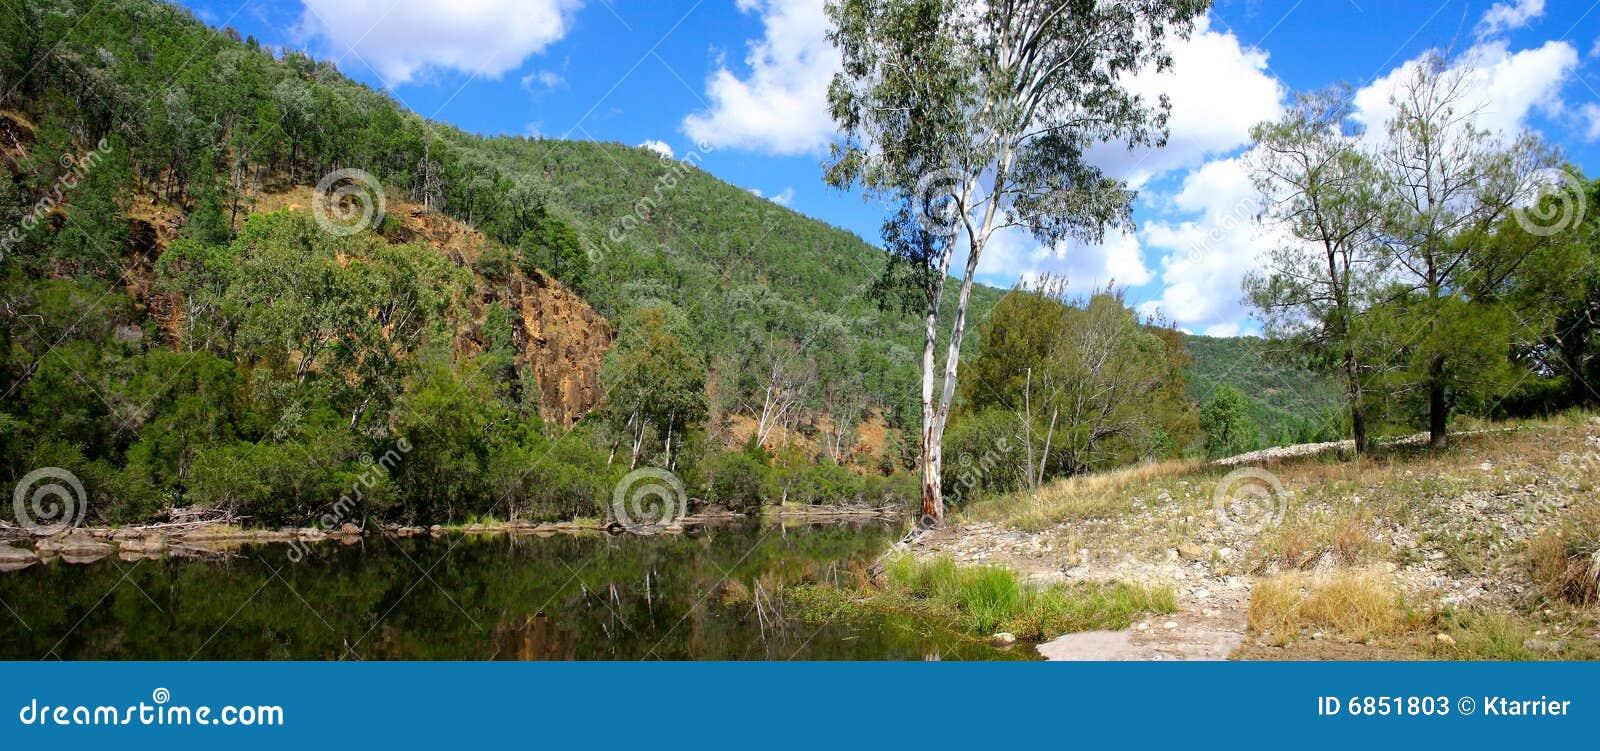 место реки 1 захолустья